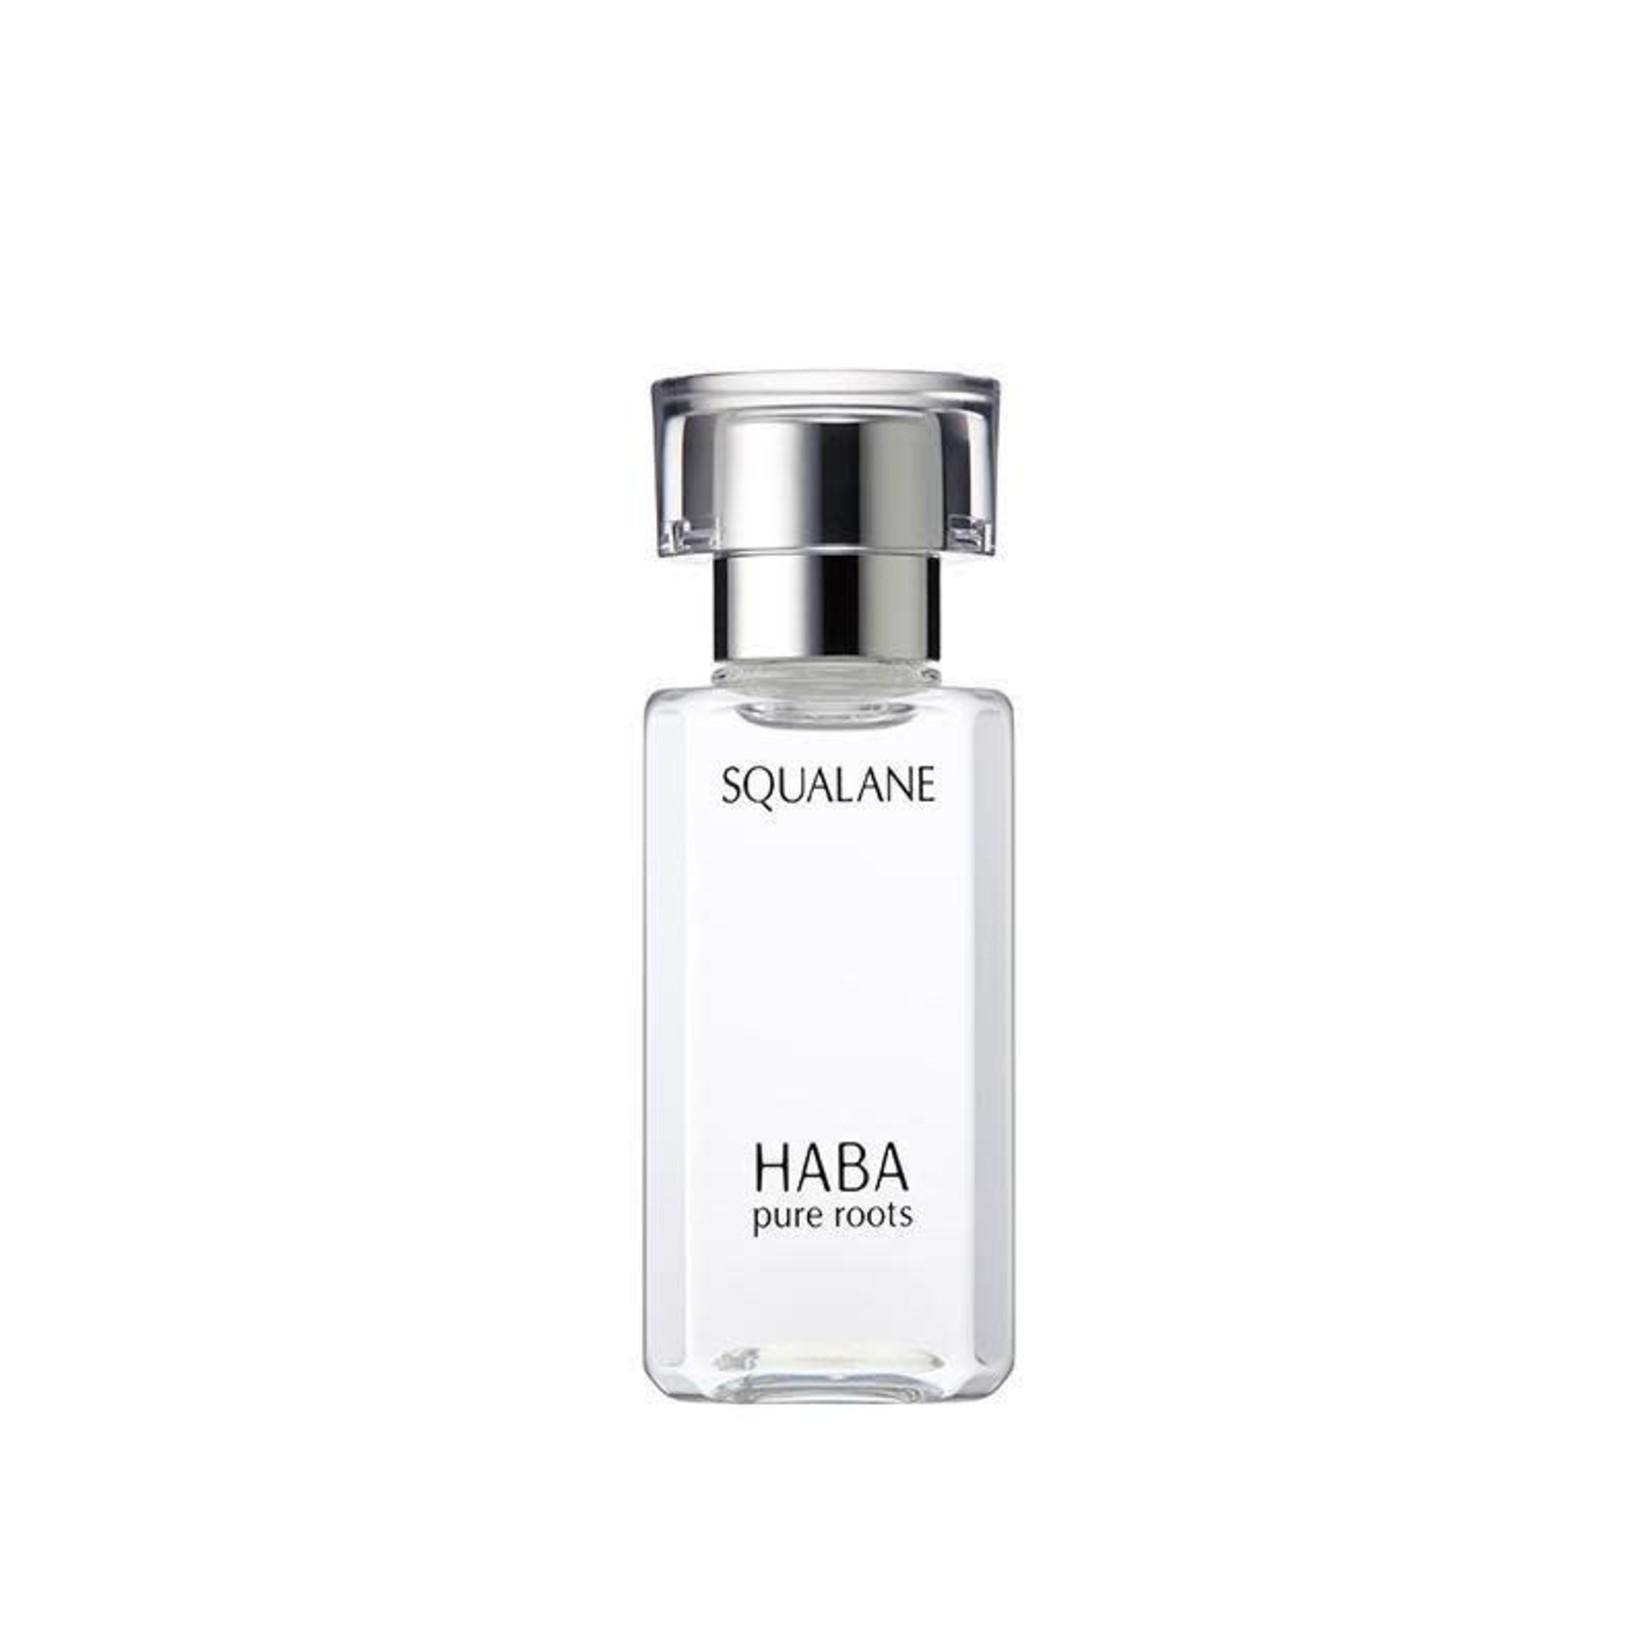 HABA Haba Squalane 30ml